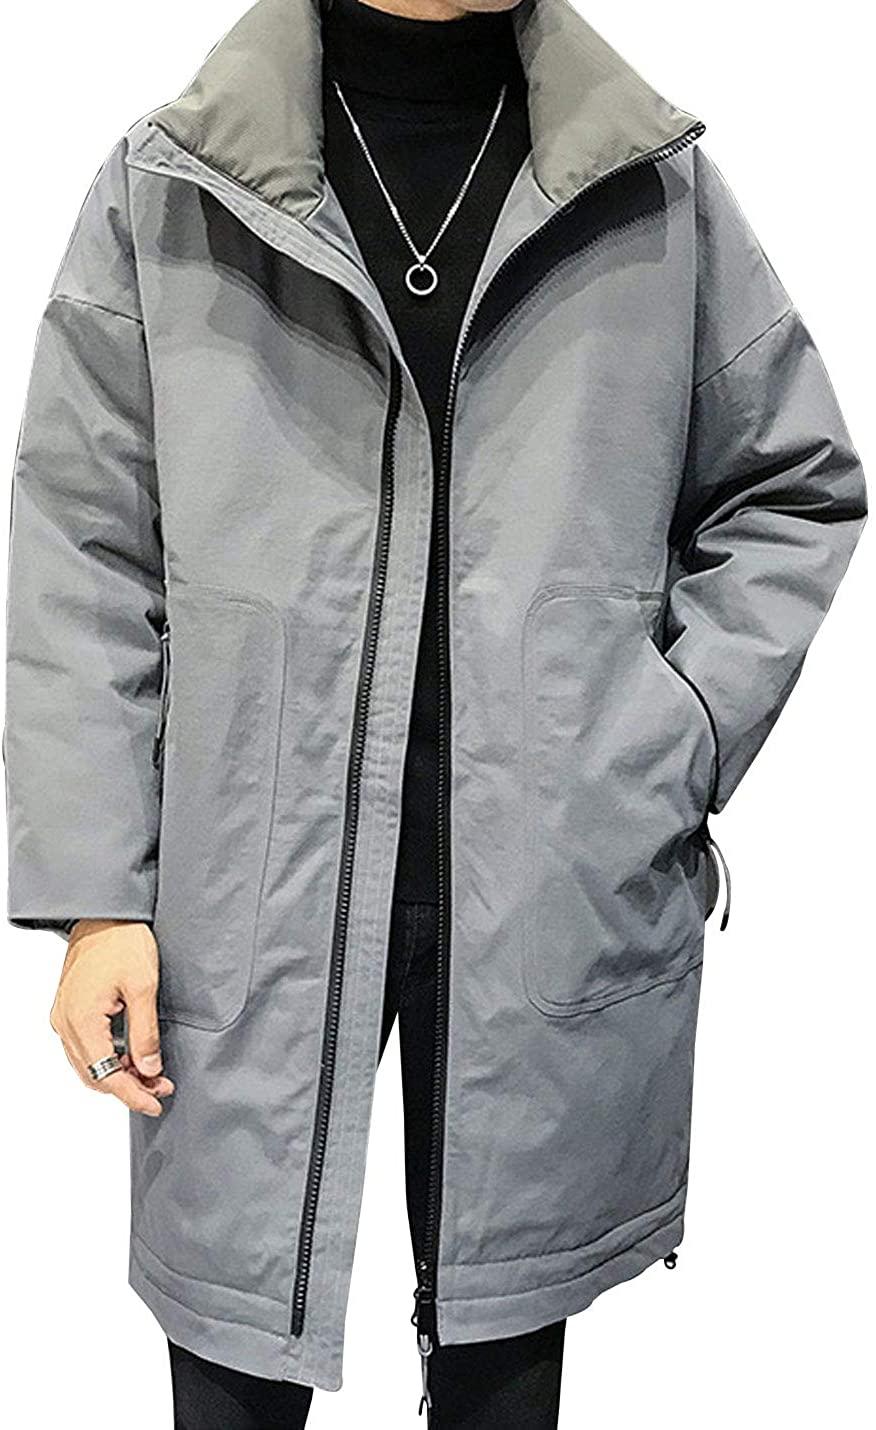 D.B.M Men's Fashion Solid Color Lapel Long Sleeve Warm Long Thick Down Jacket